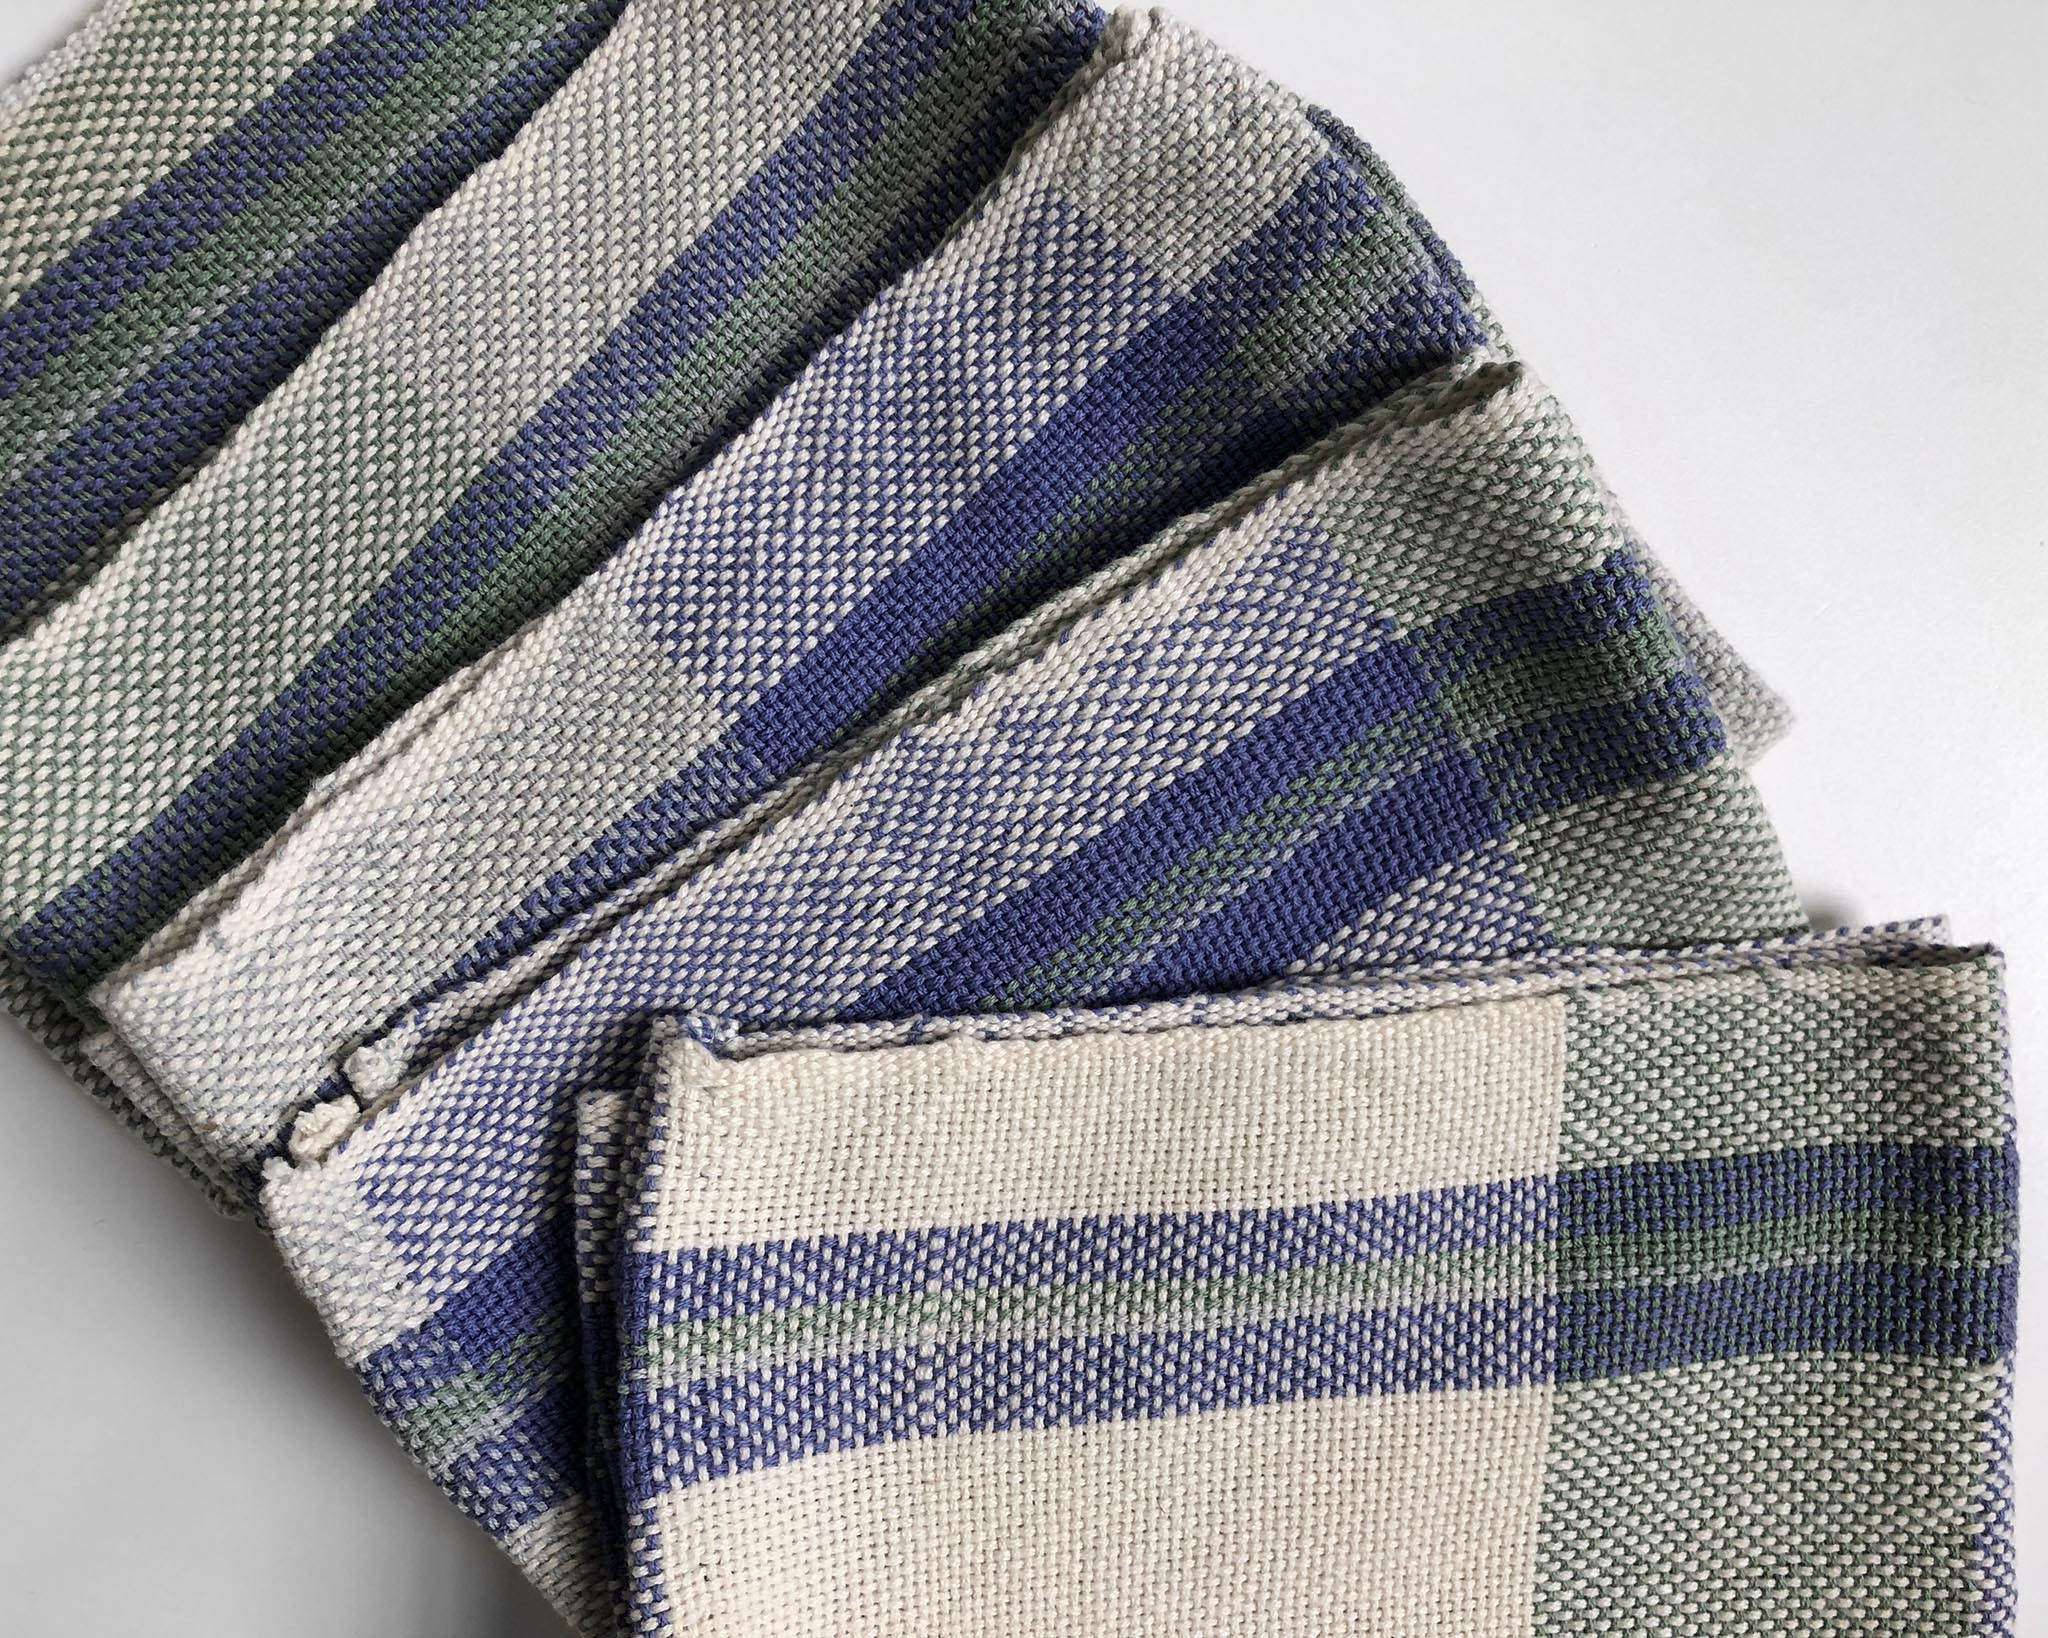 Beginner Rigid Heddle Cotton Tea Towels Free Weaving Pattern